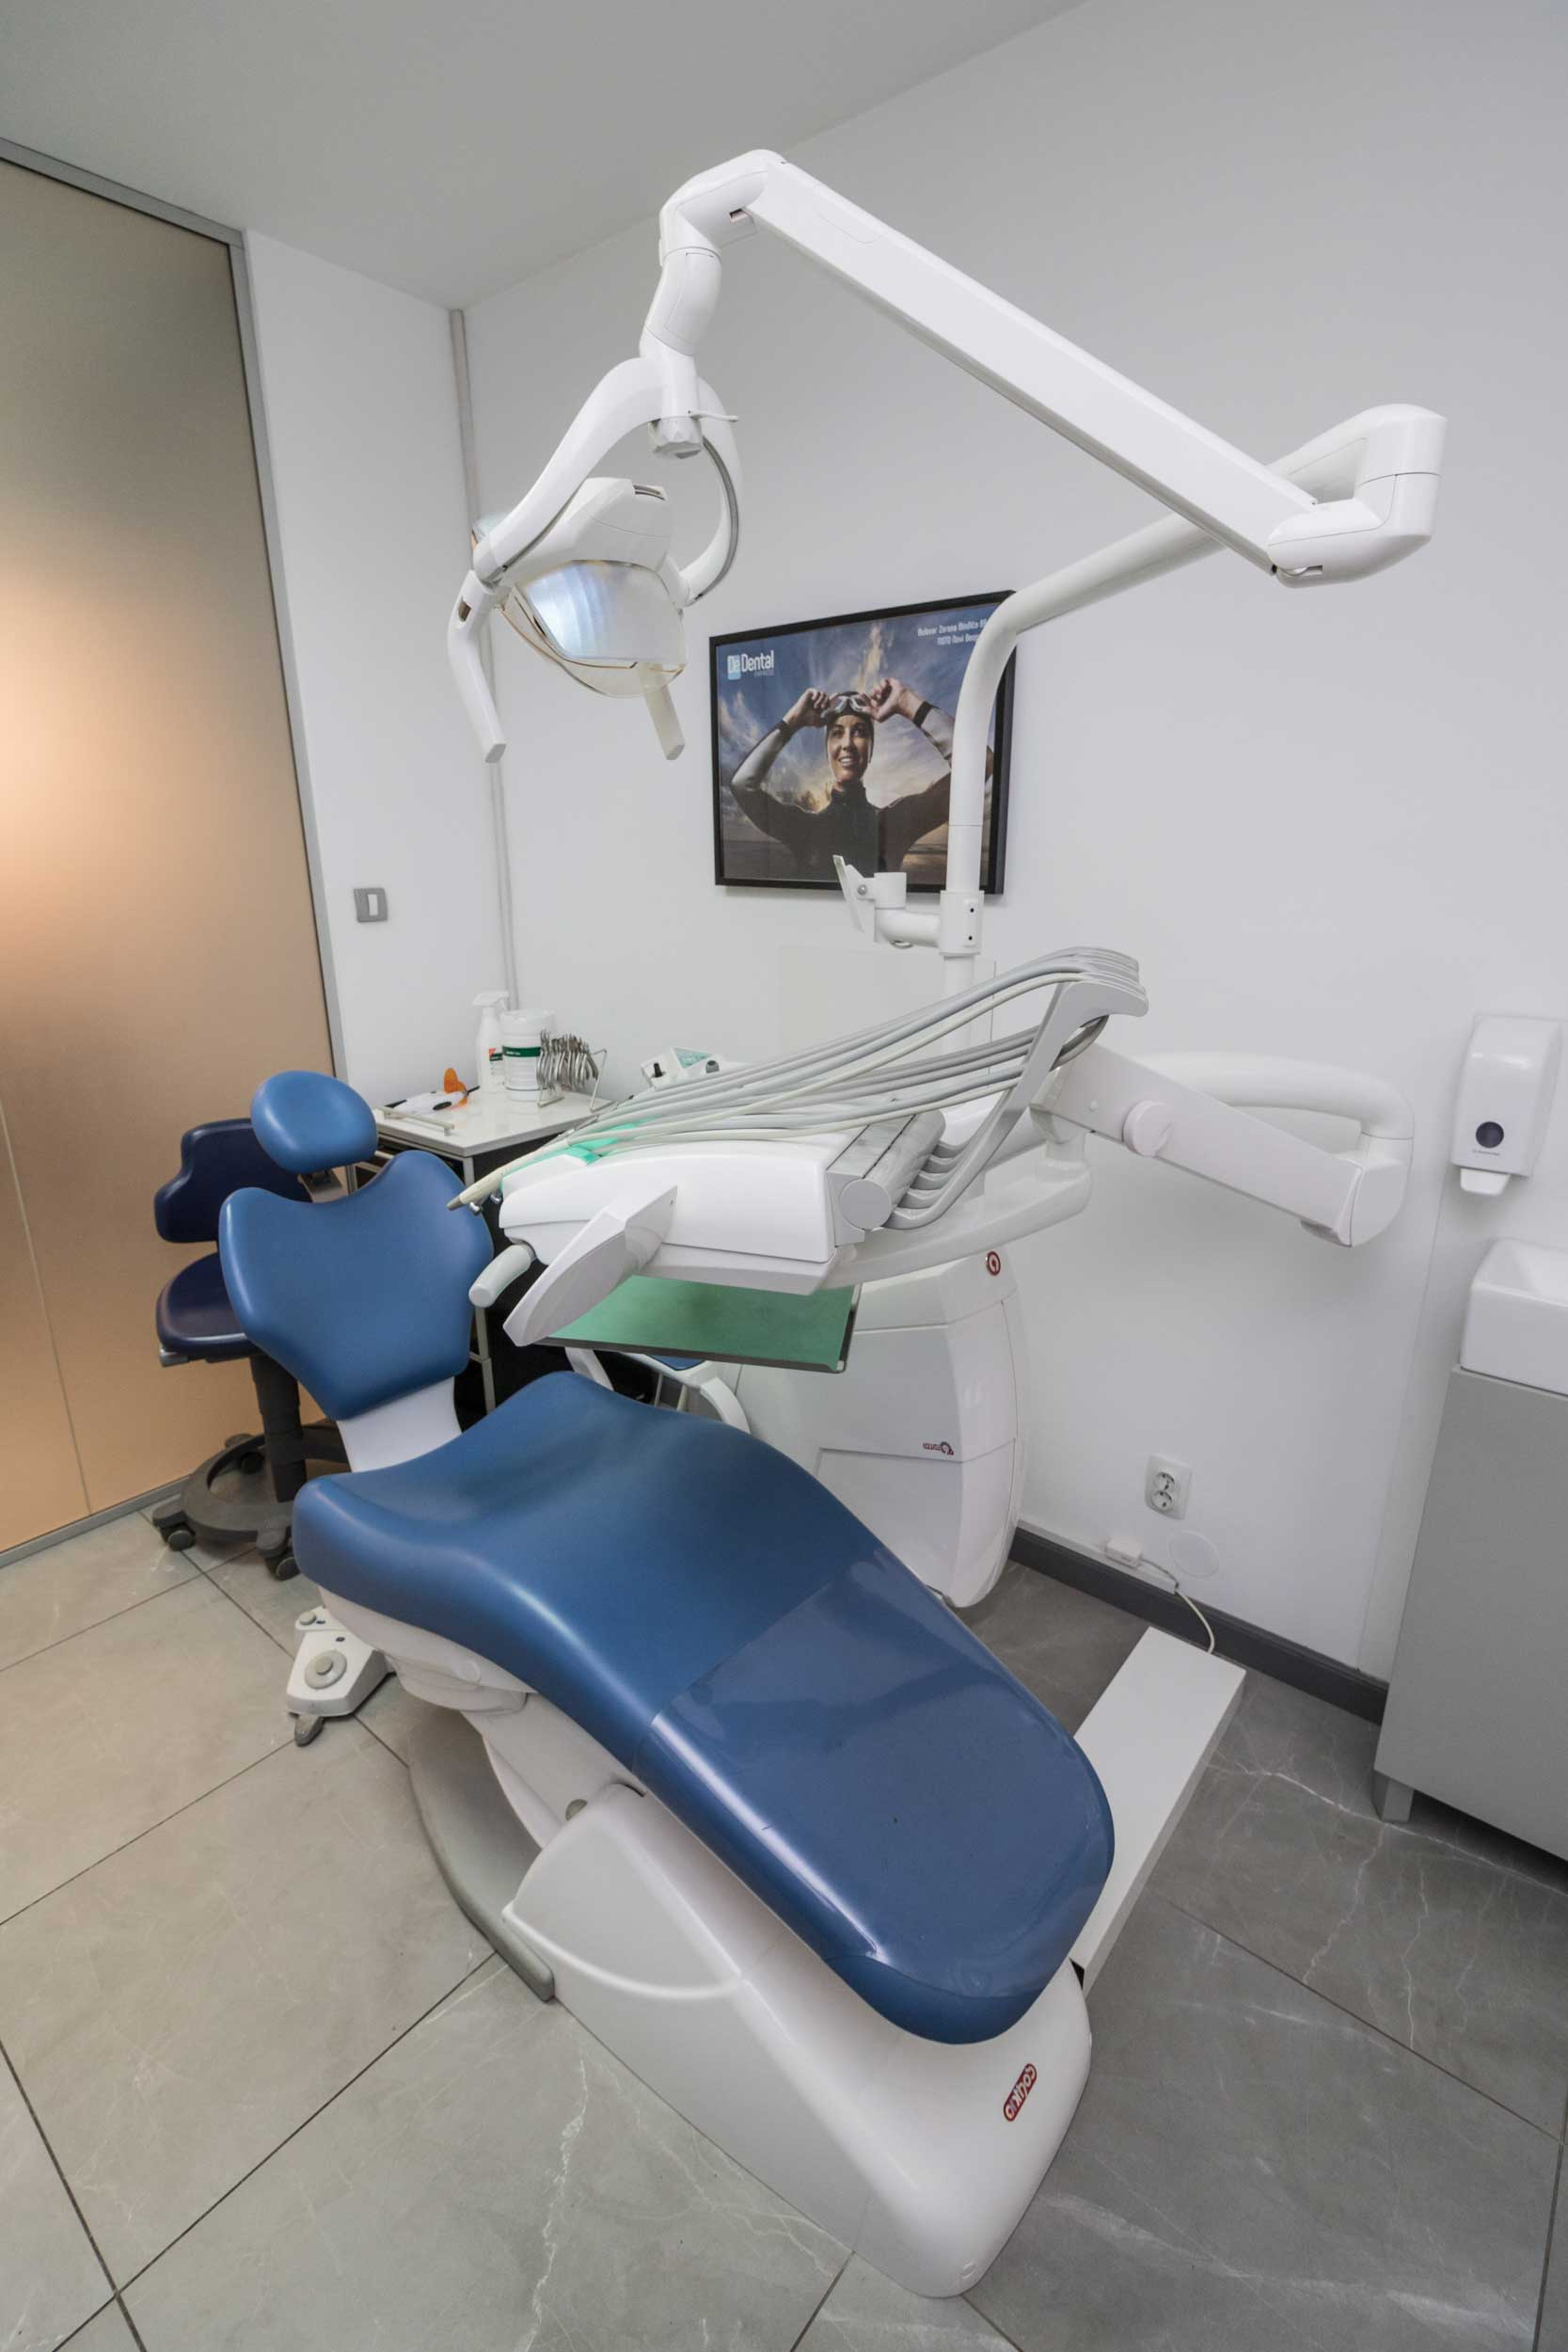 stomatoloska-ordinacija-vunjak-dental-clinic-ordinacija-7